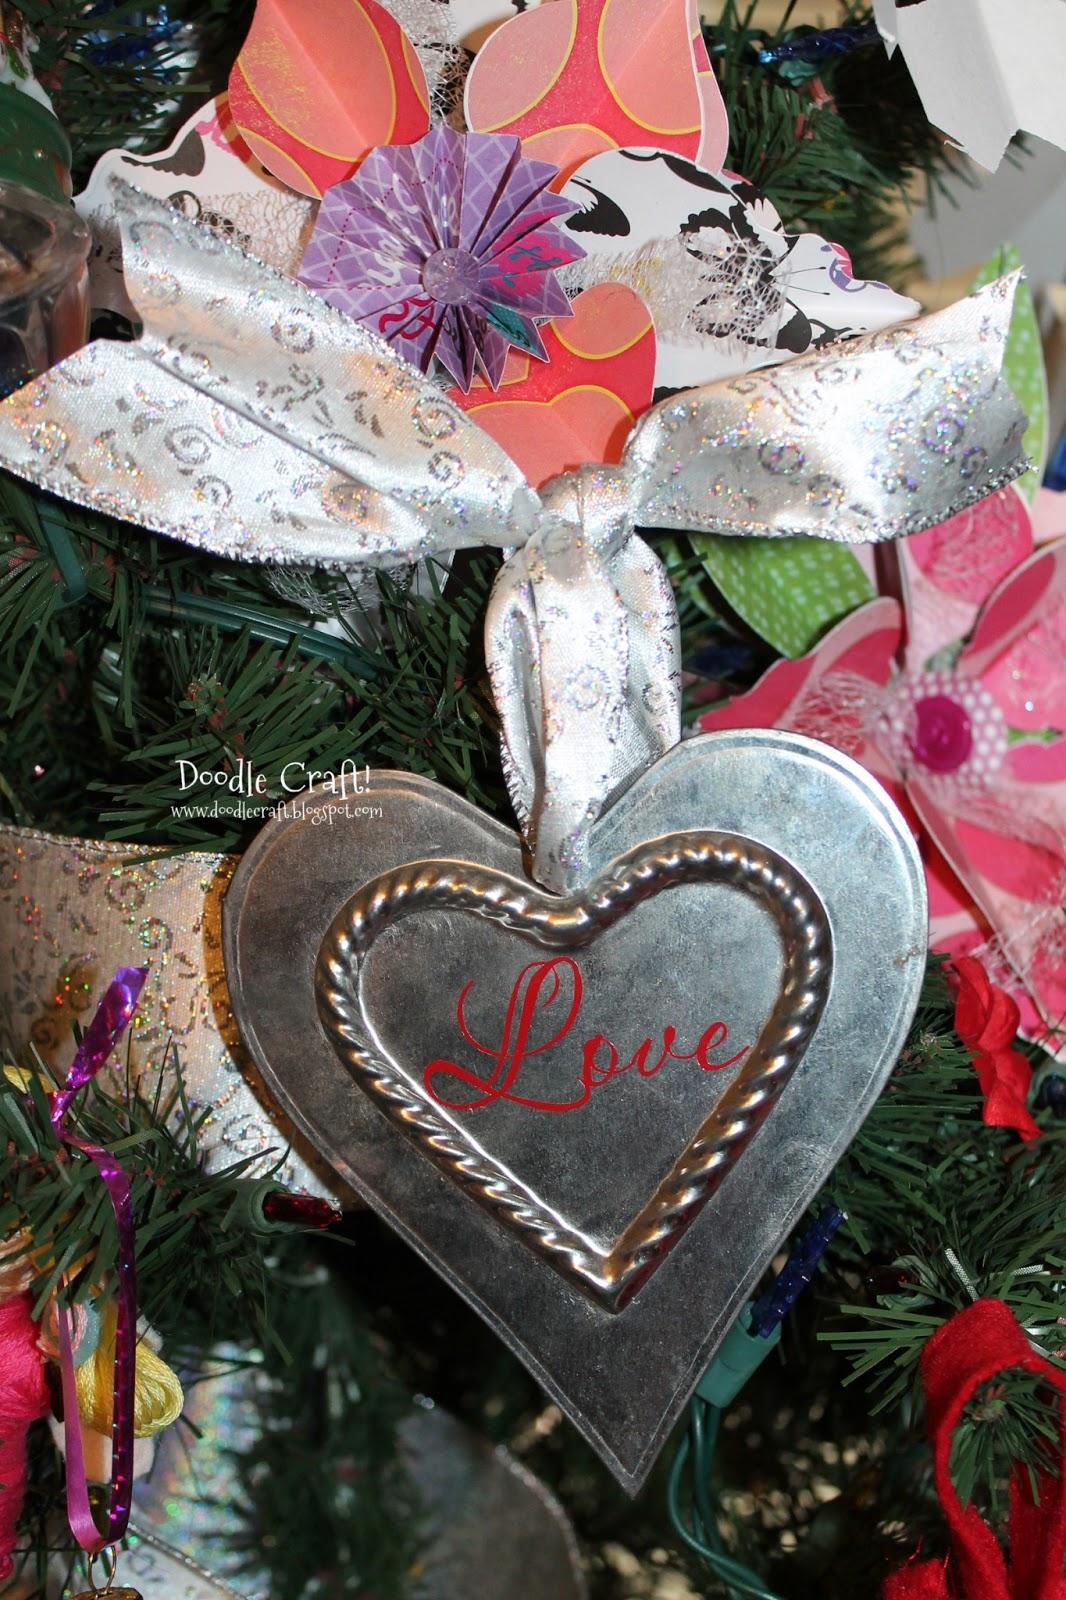 doodlecraft love heart ornaments. Black Bedroom Furniture Sets. Home Design Ideas